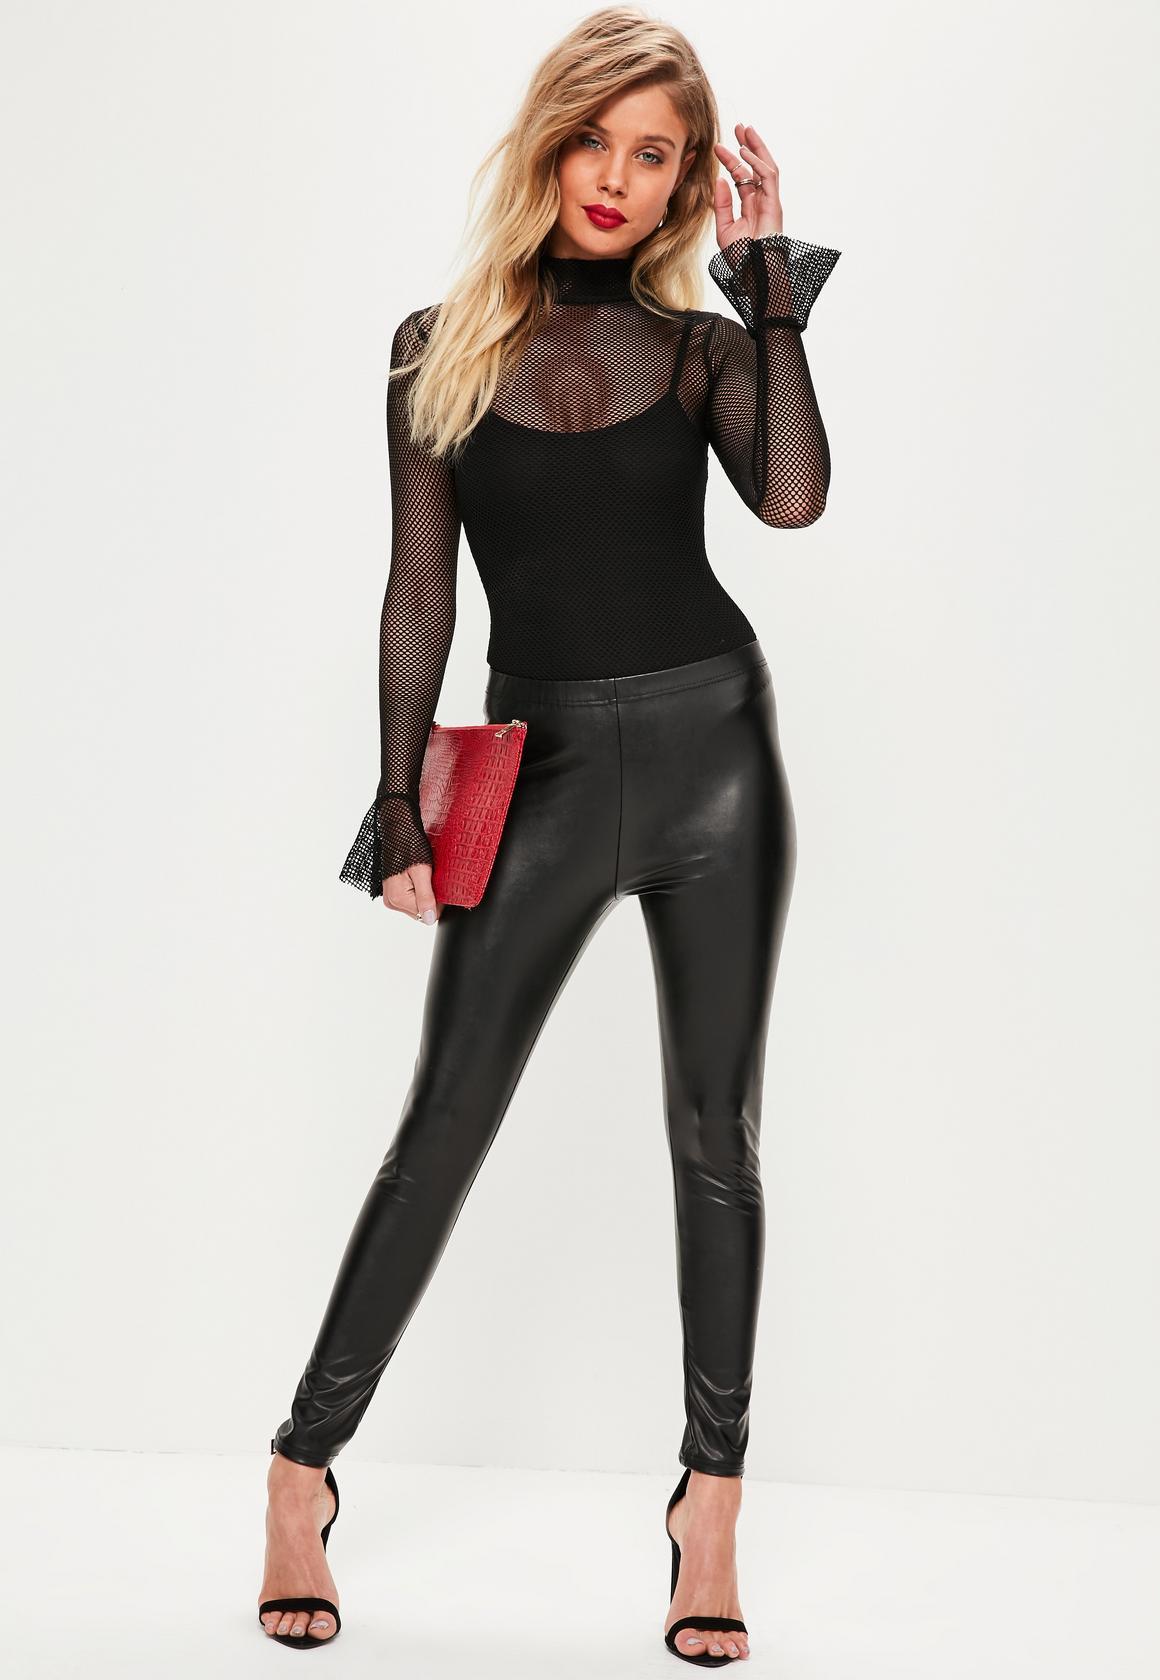 leather leggings previous next LUKRMDF